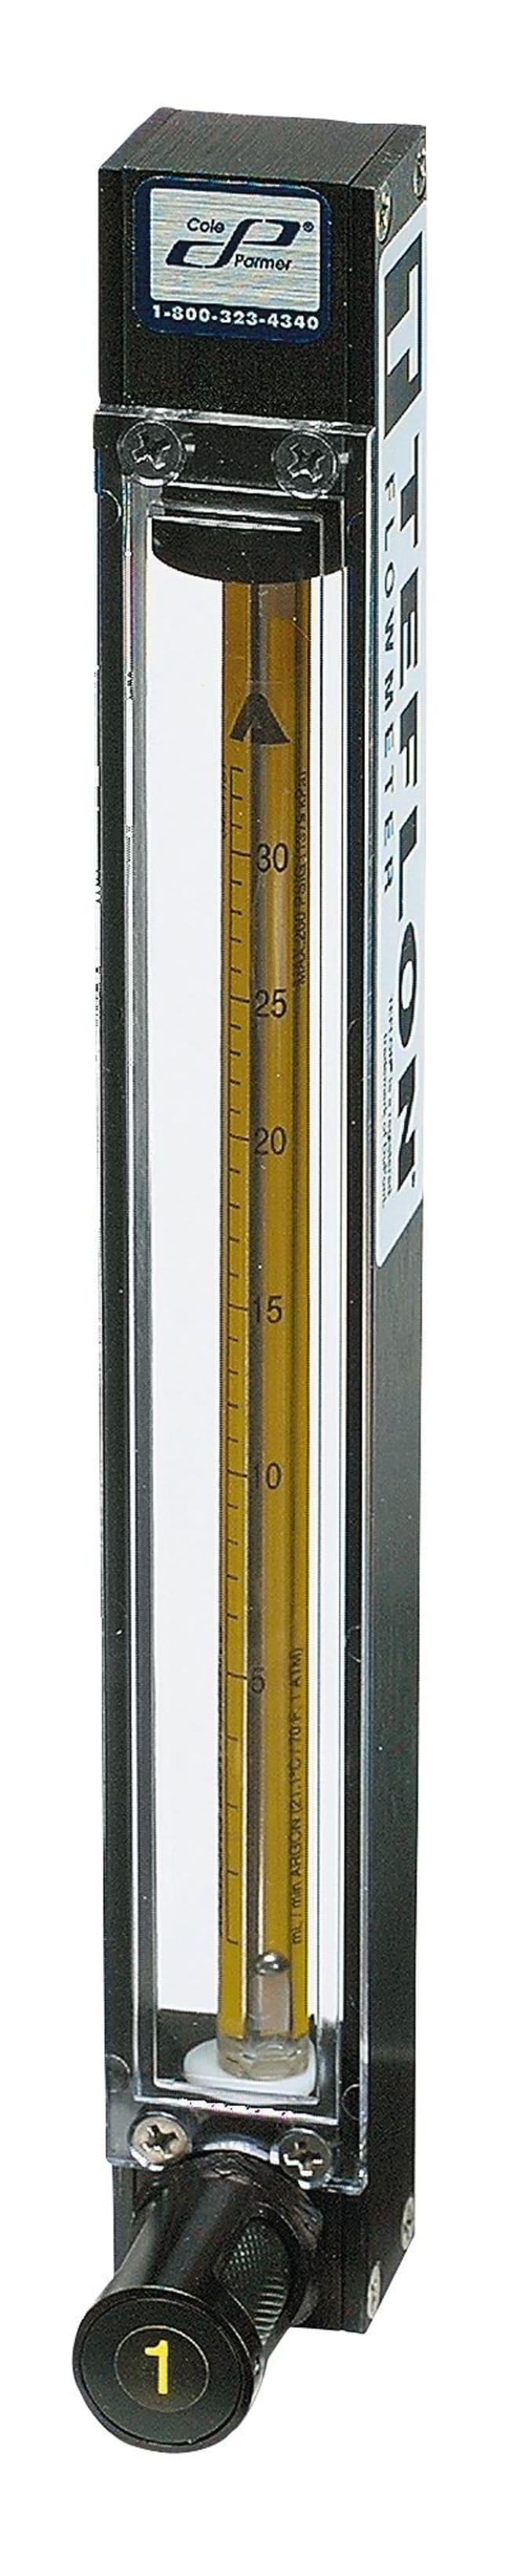 Cole-ParmerMasterflex Variable-Area Flowmeter with Valve, Direct-Reading,